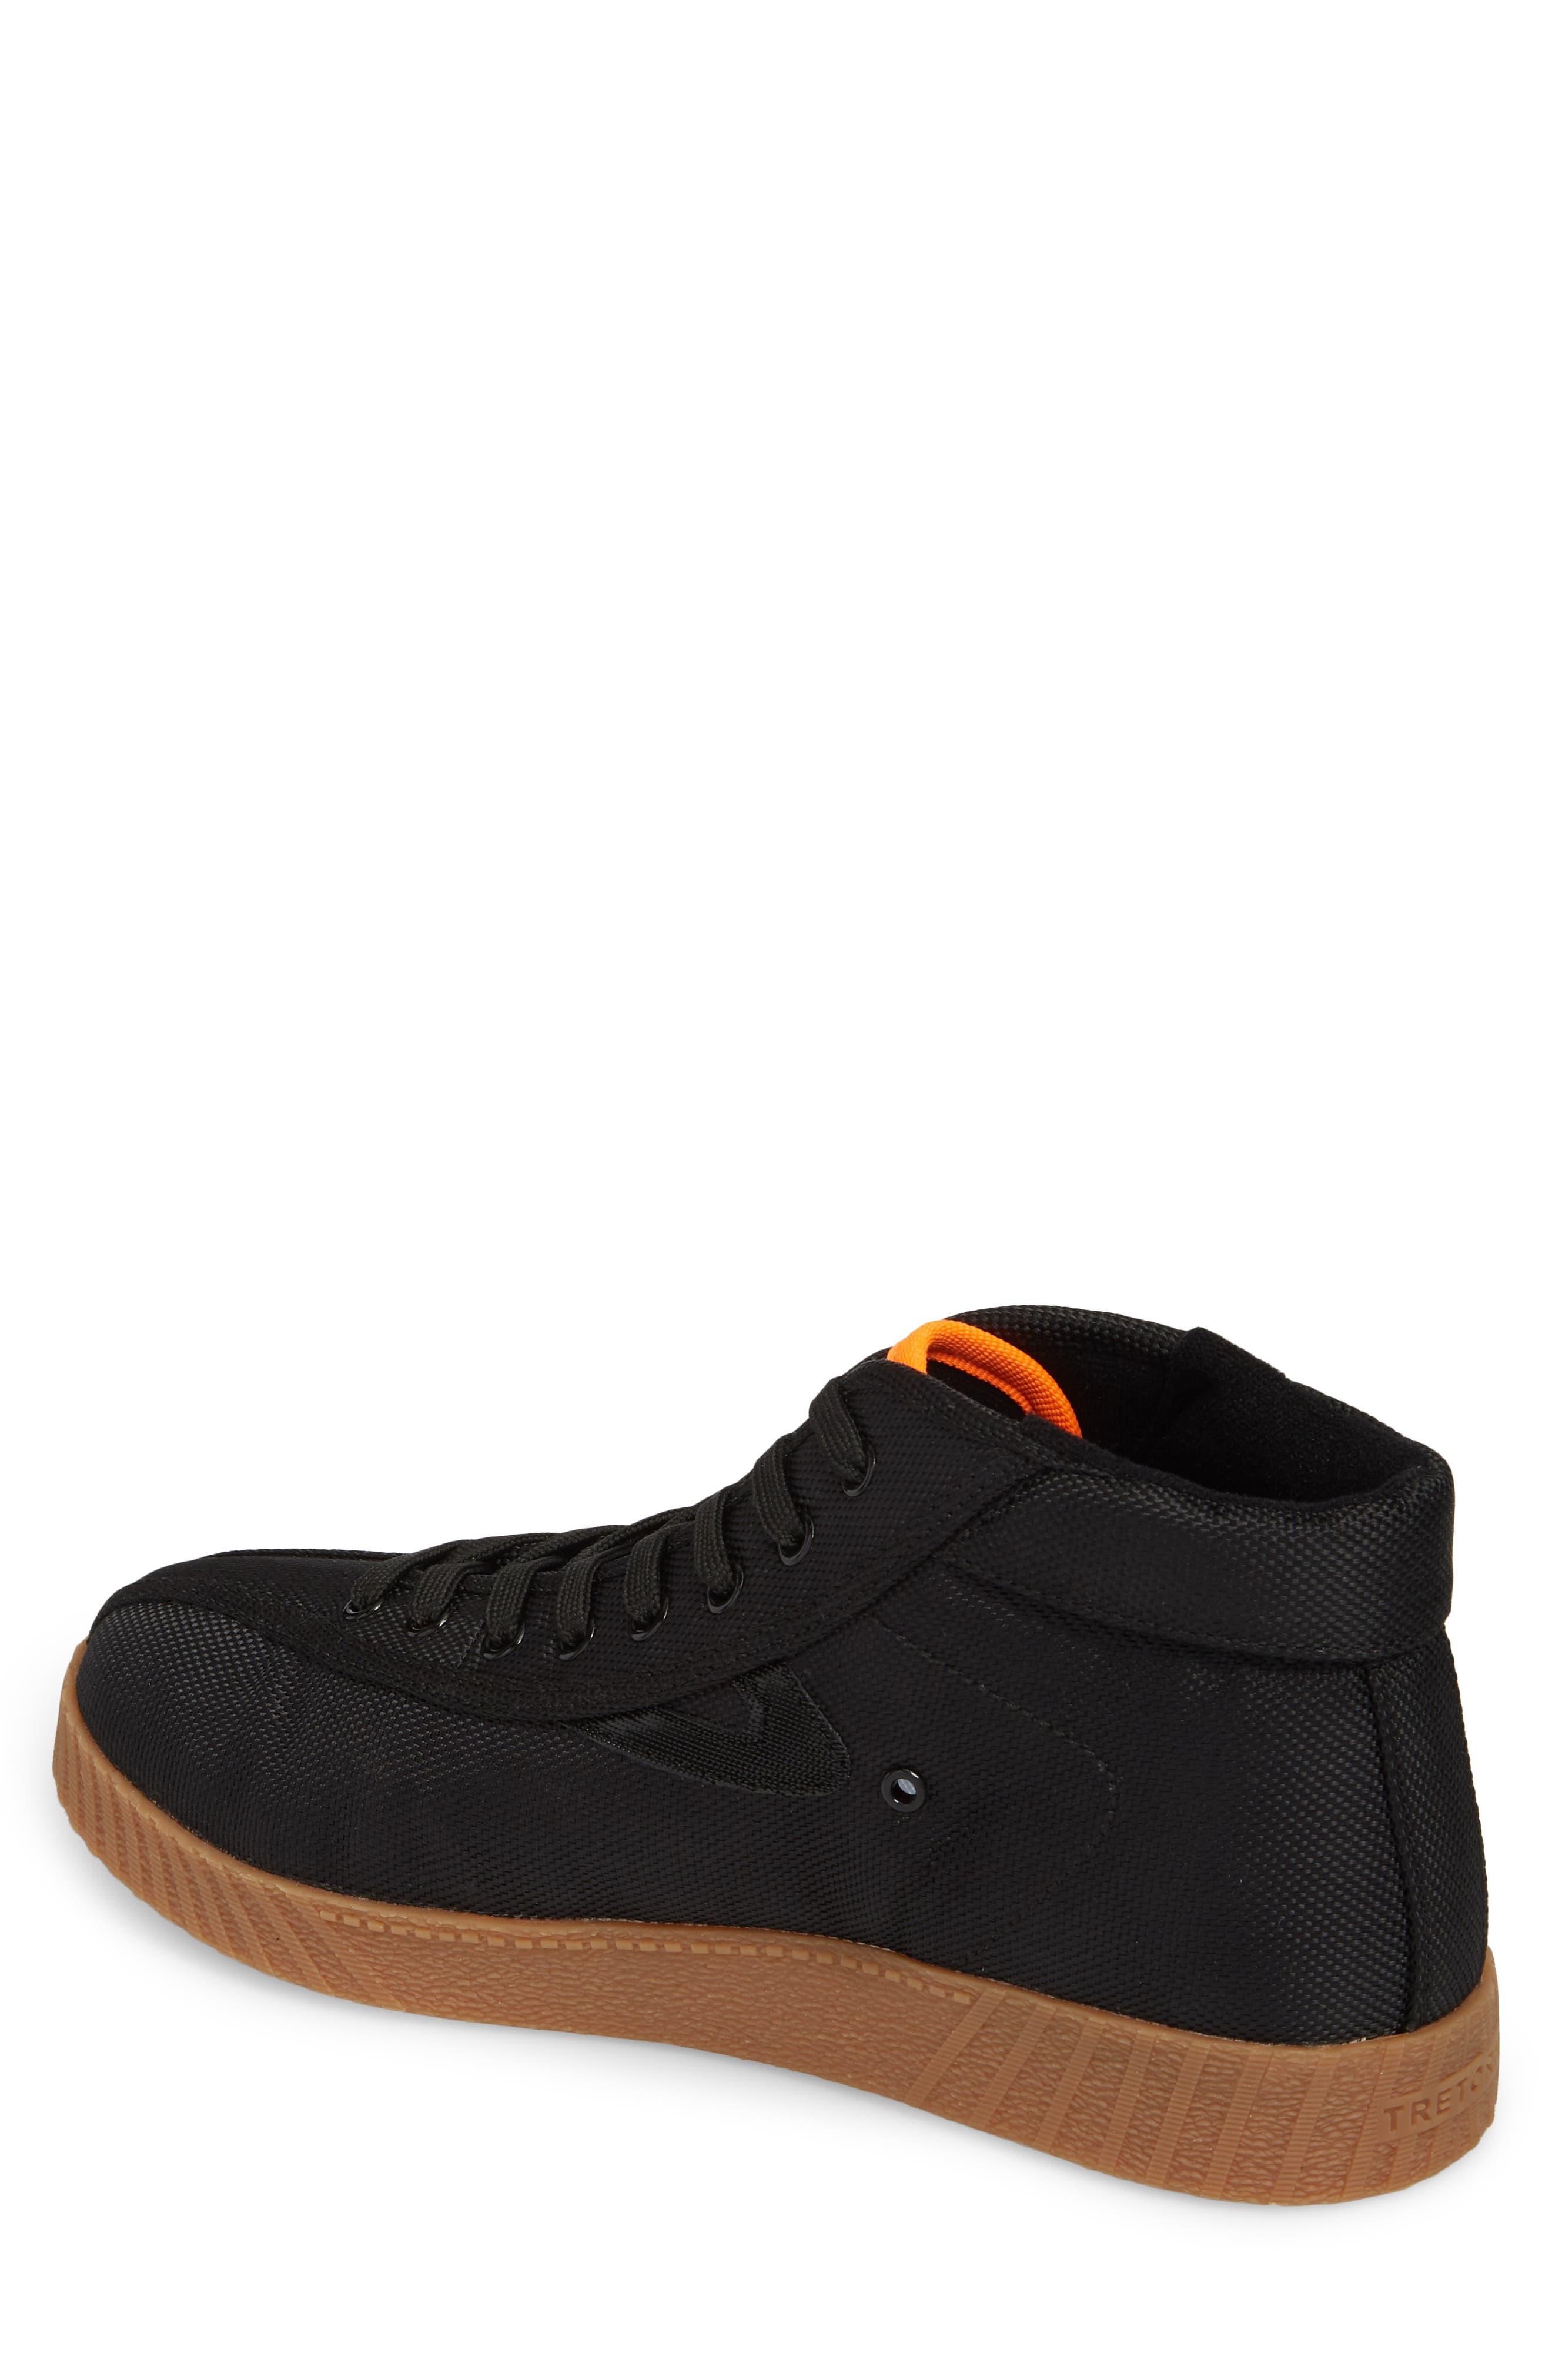 Andre 3000 Nylite High Top Sneaker,                             Alternate thumbnail 2, color,                             Black/ Neon Orange Nylon